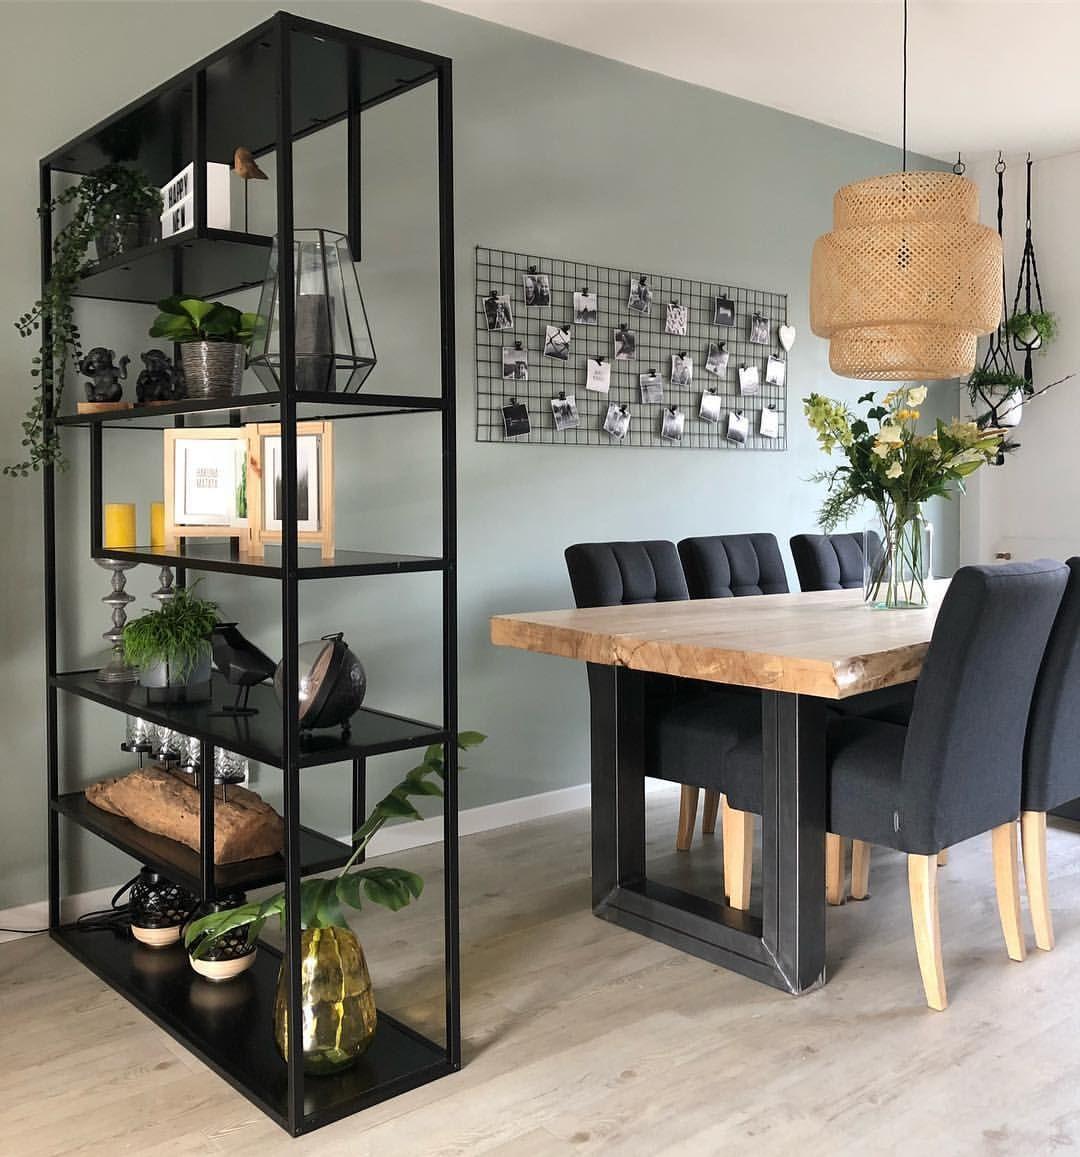 45 Amazing Kitchen Lighting Ideas You Will Love Interior Design